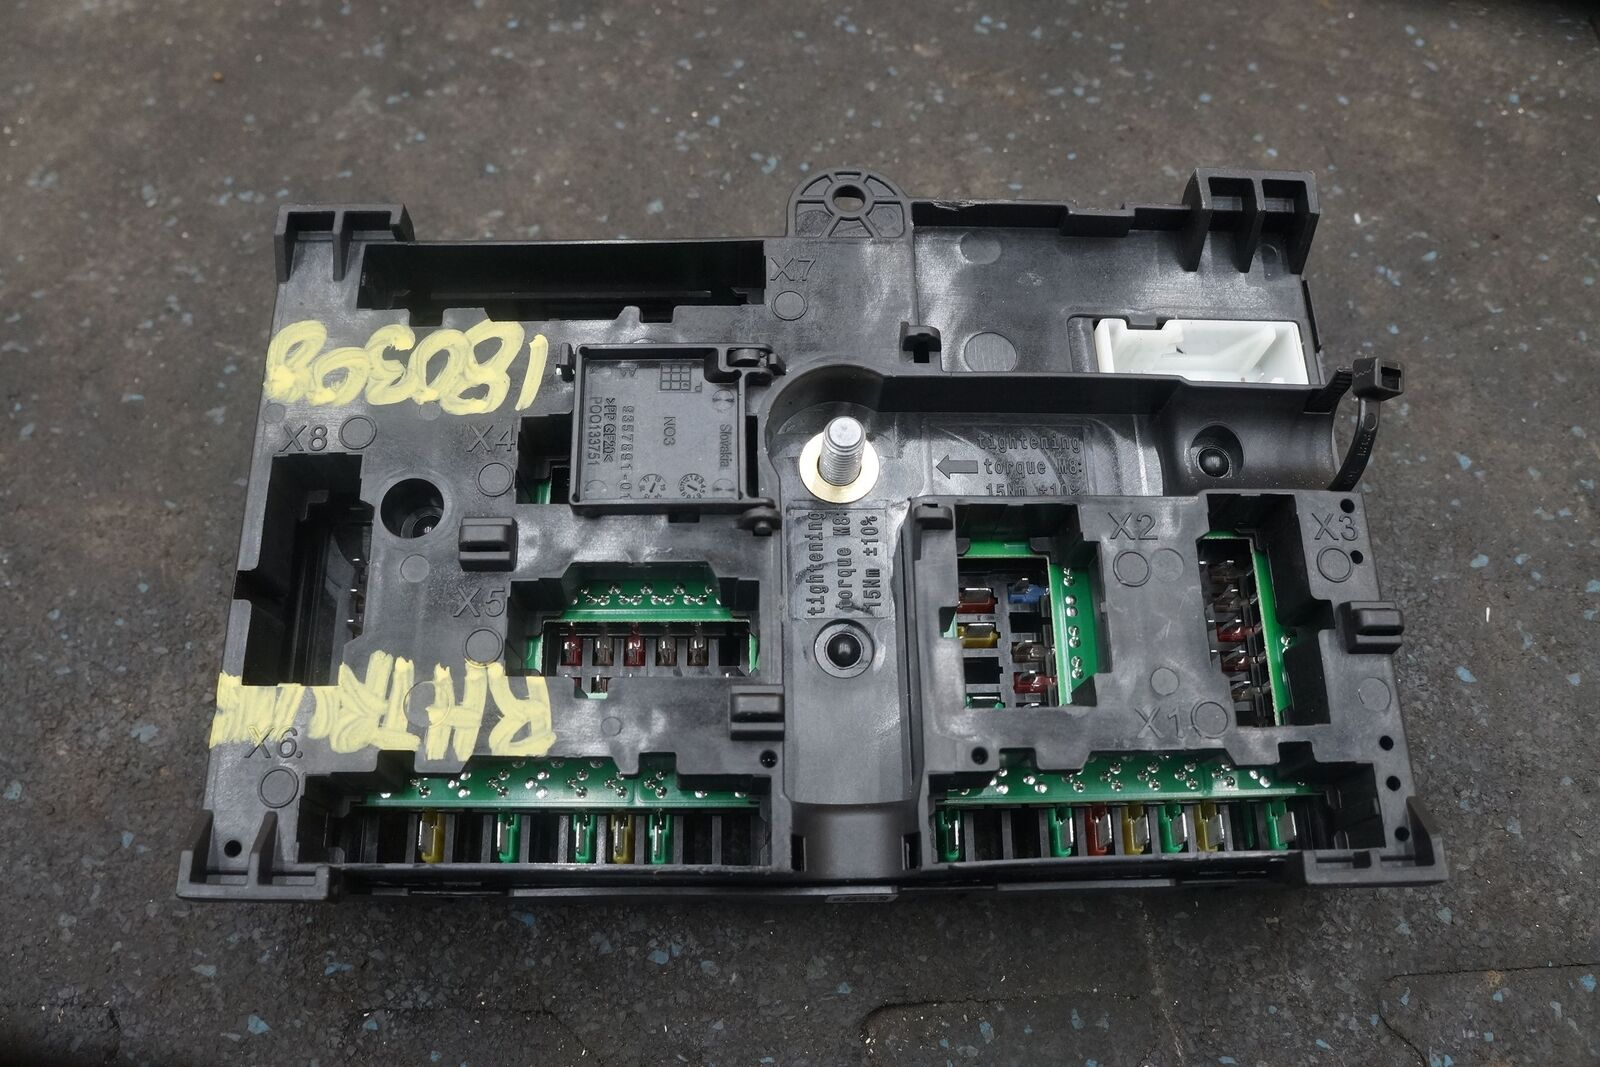 Power Fuse Box Detailed Schematics Diagram 1999 Bmw 740il Rear Distribution Block 61149377503 750i 740i G11 Dakota